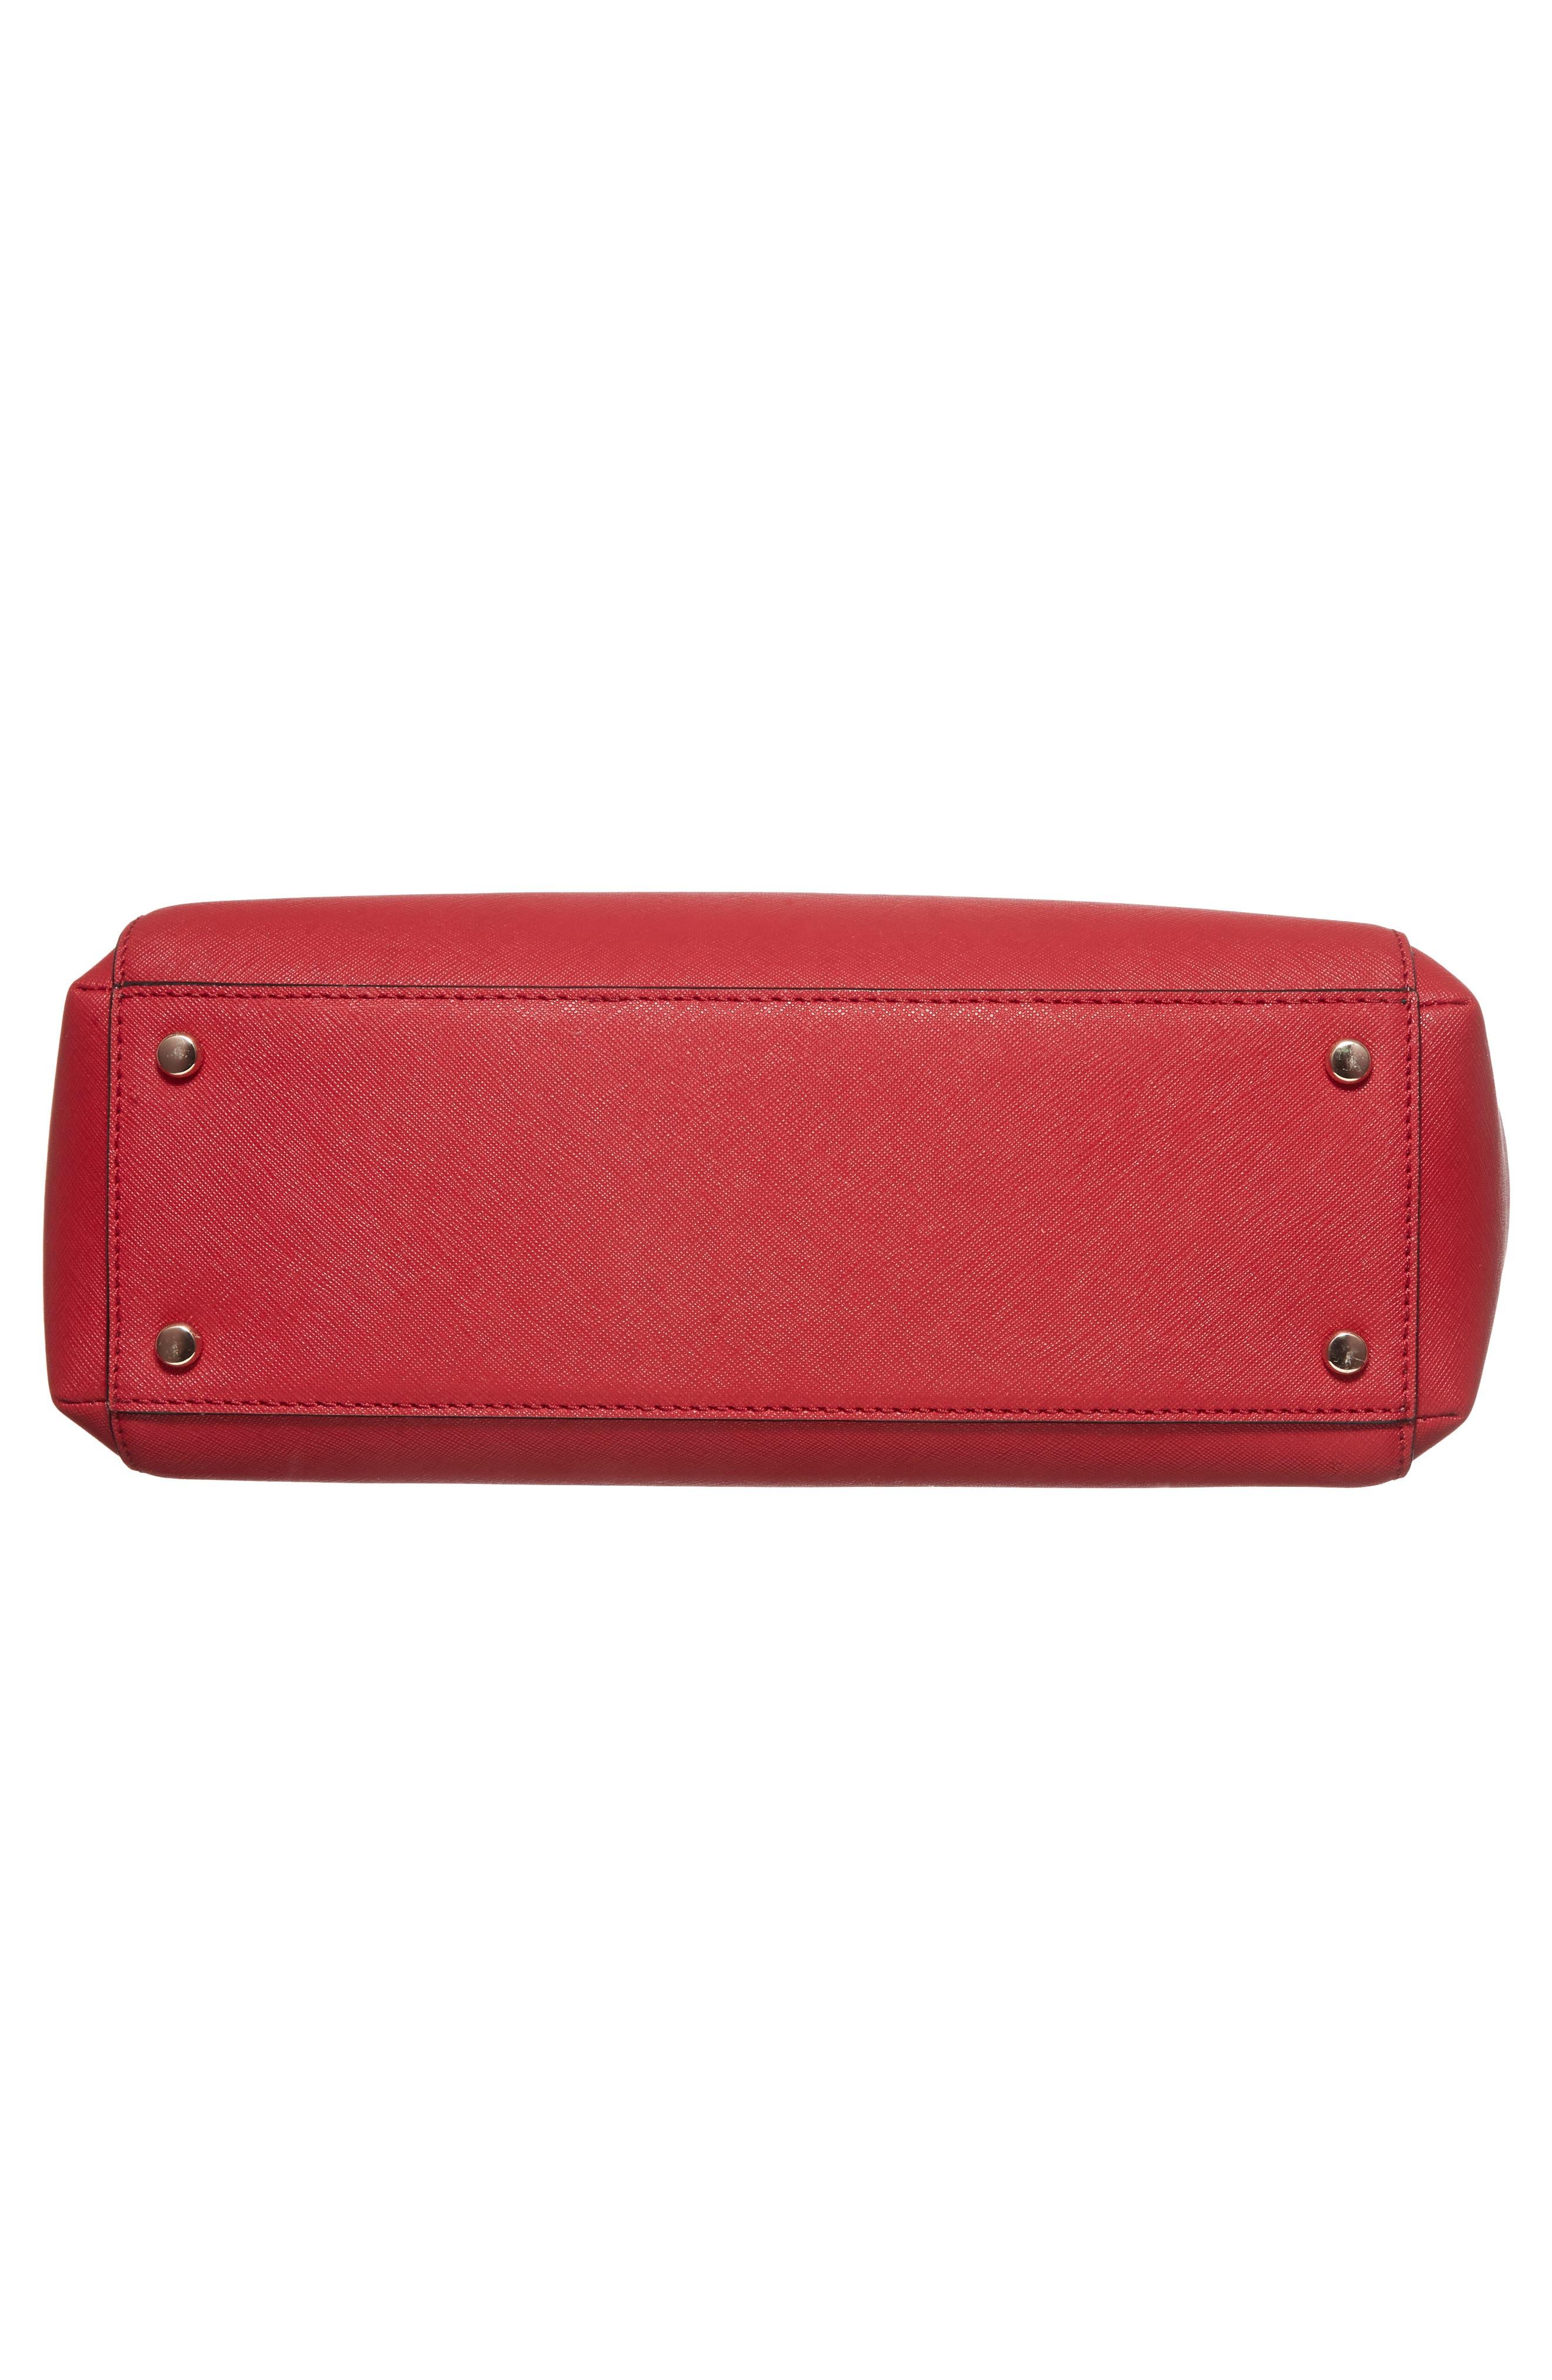 cameron street - teegan calfskin leather satchel,                             Alternate thumbnail 6, color,                             638